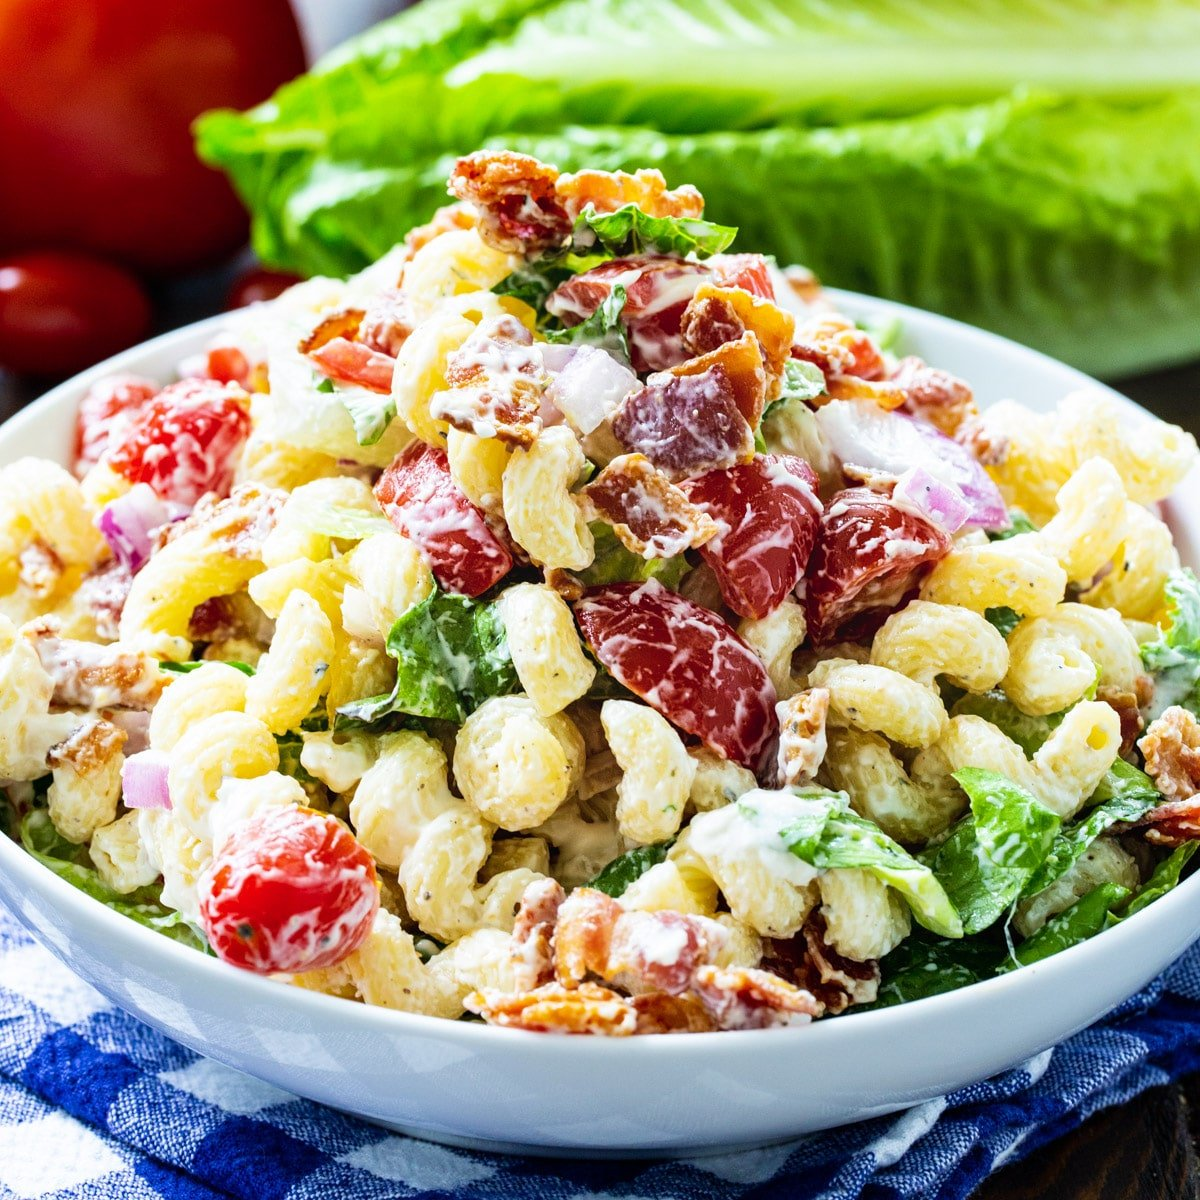 BLT Pasta Salad in a bowl.